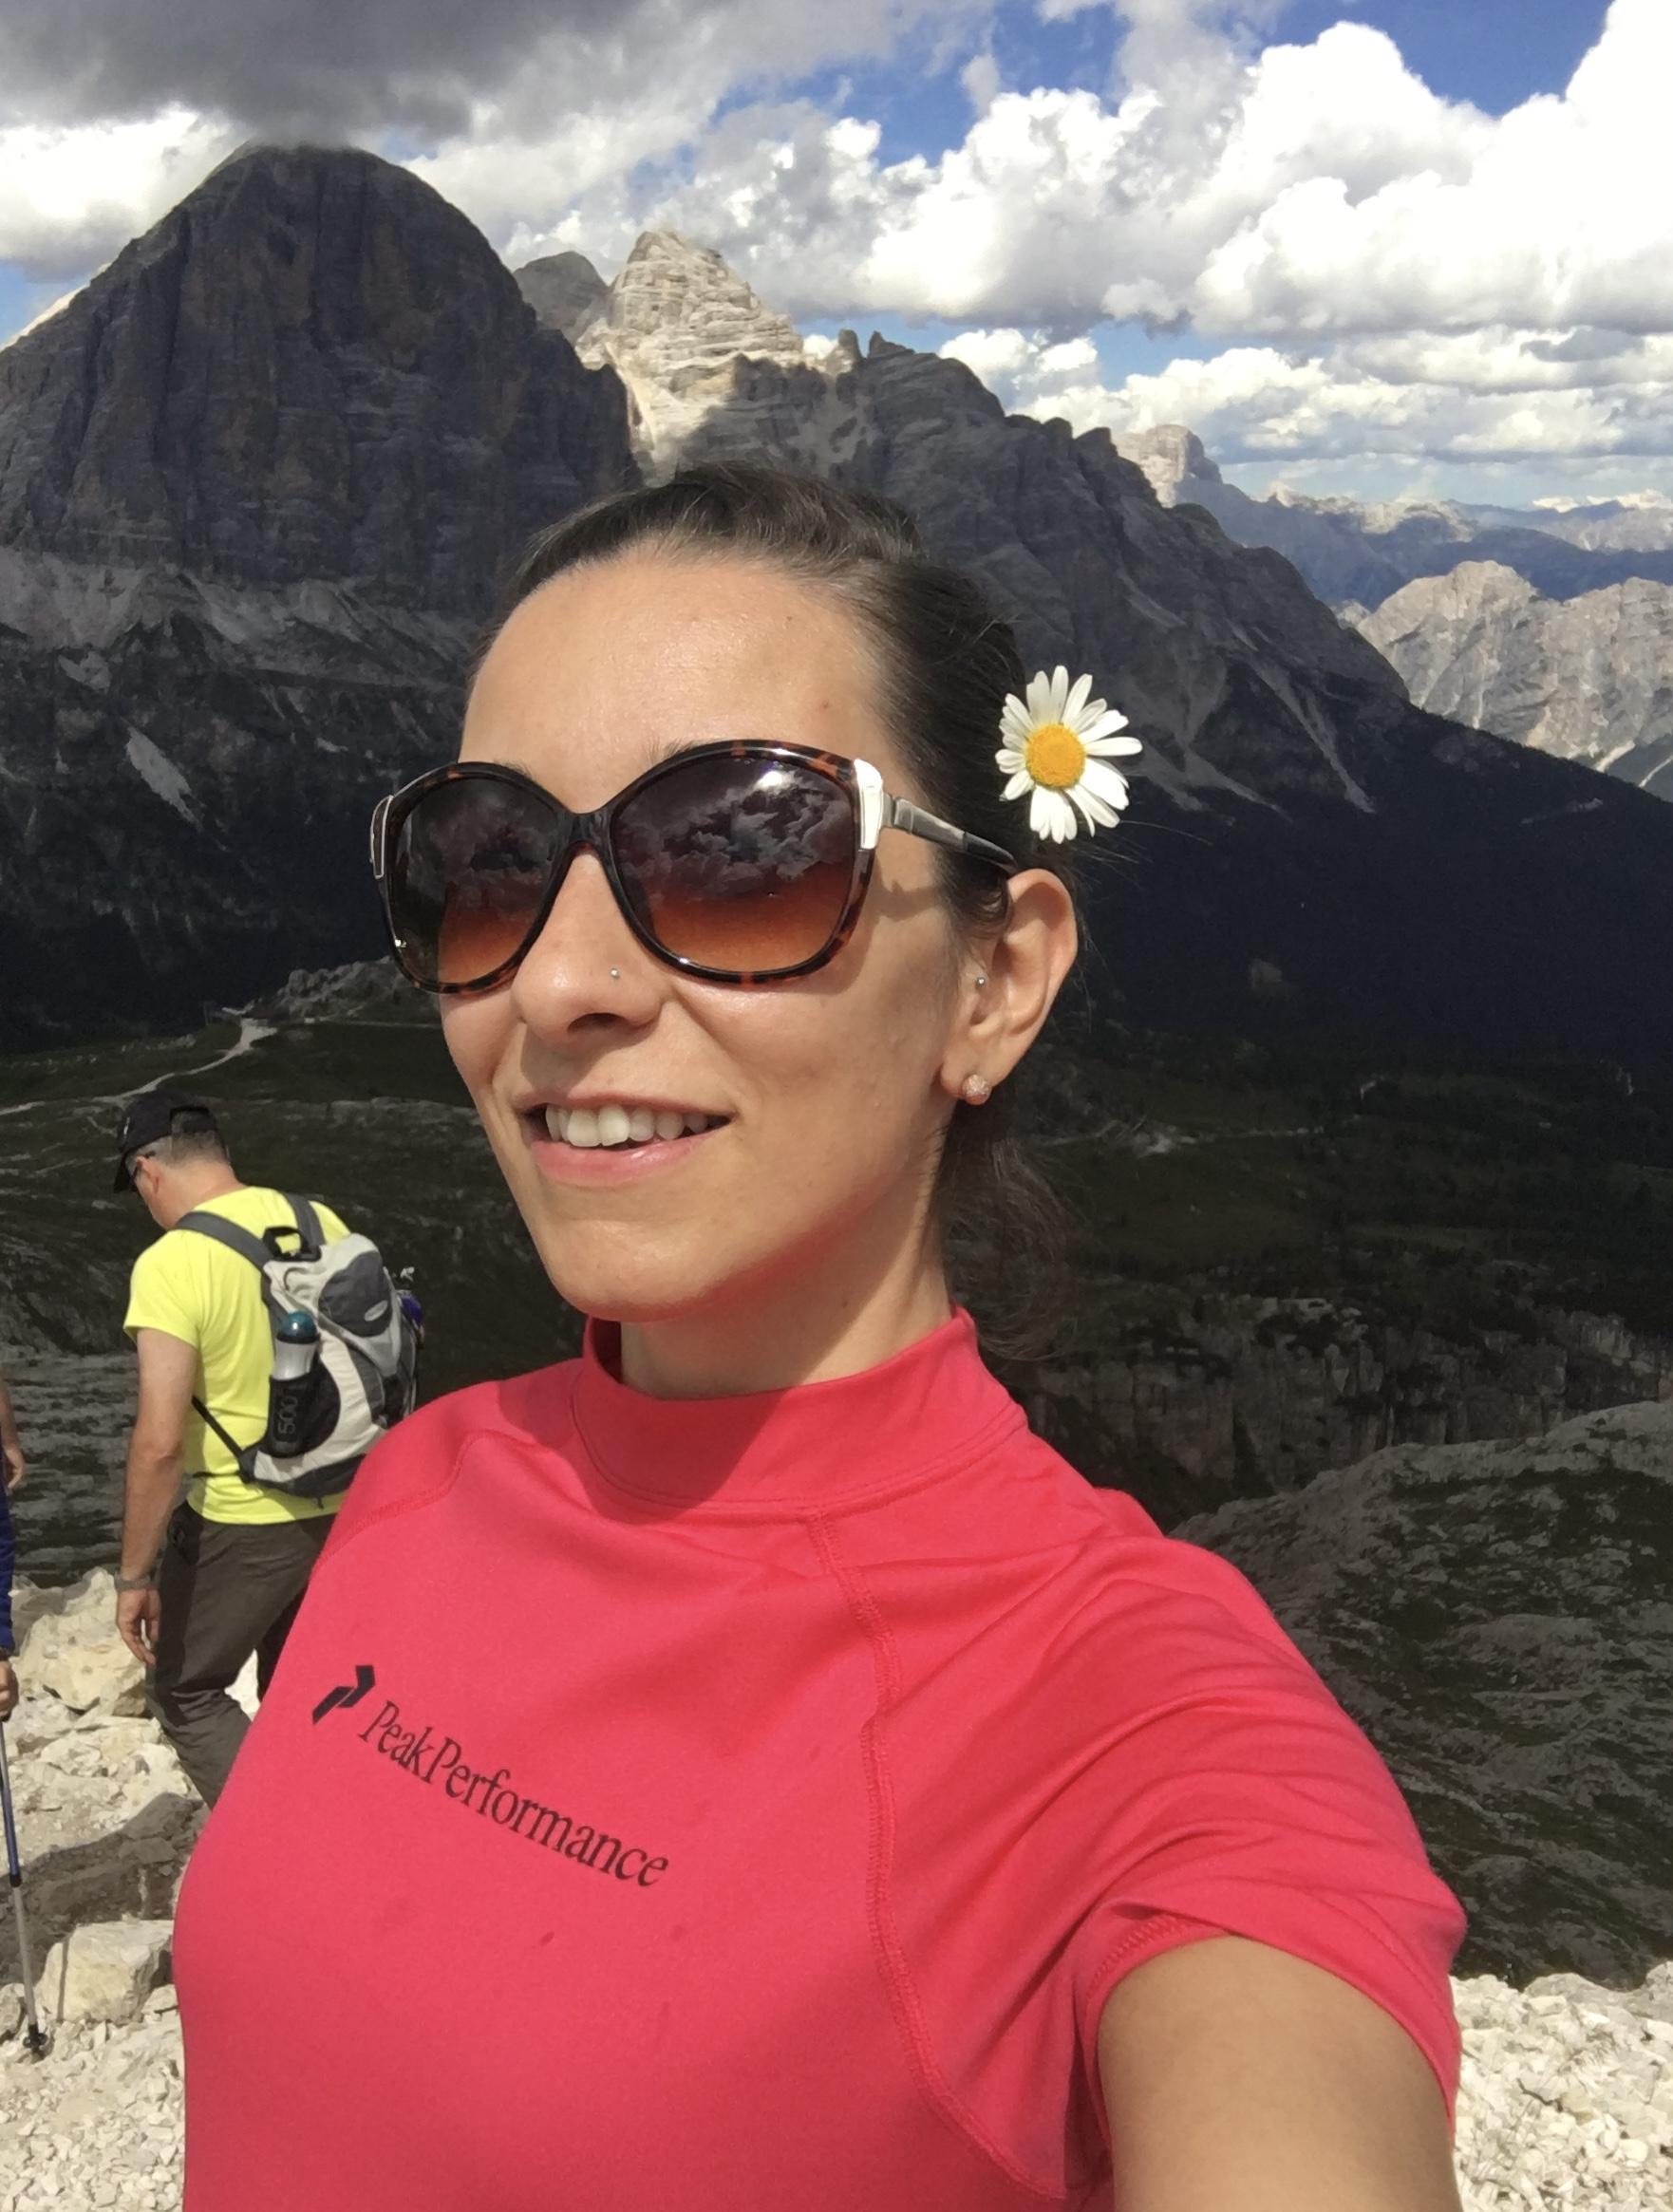 Silvia A. Carretta